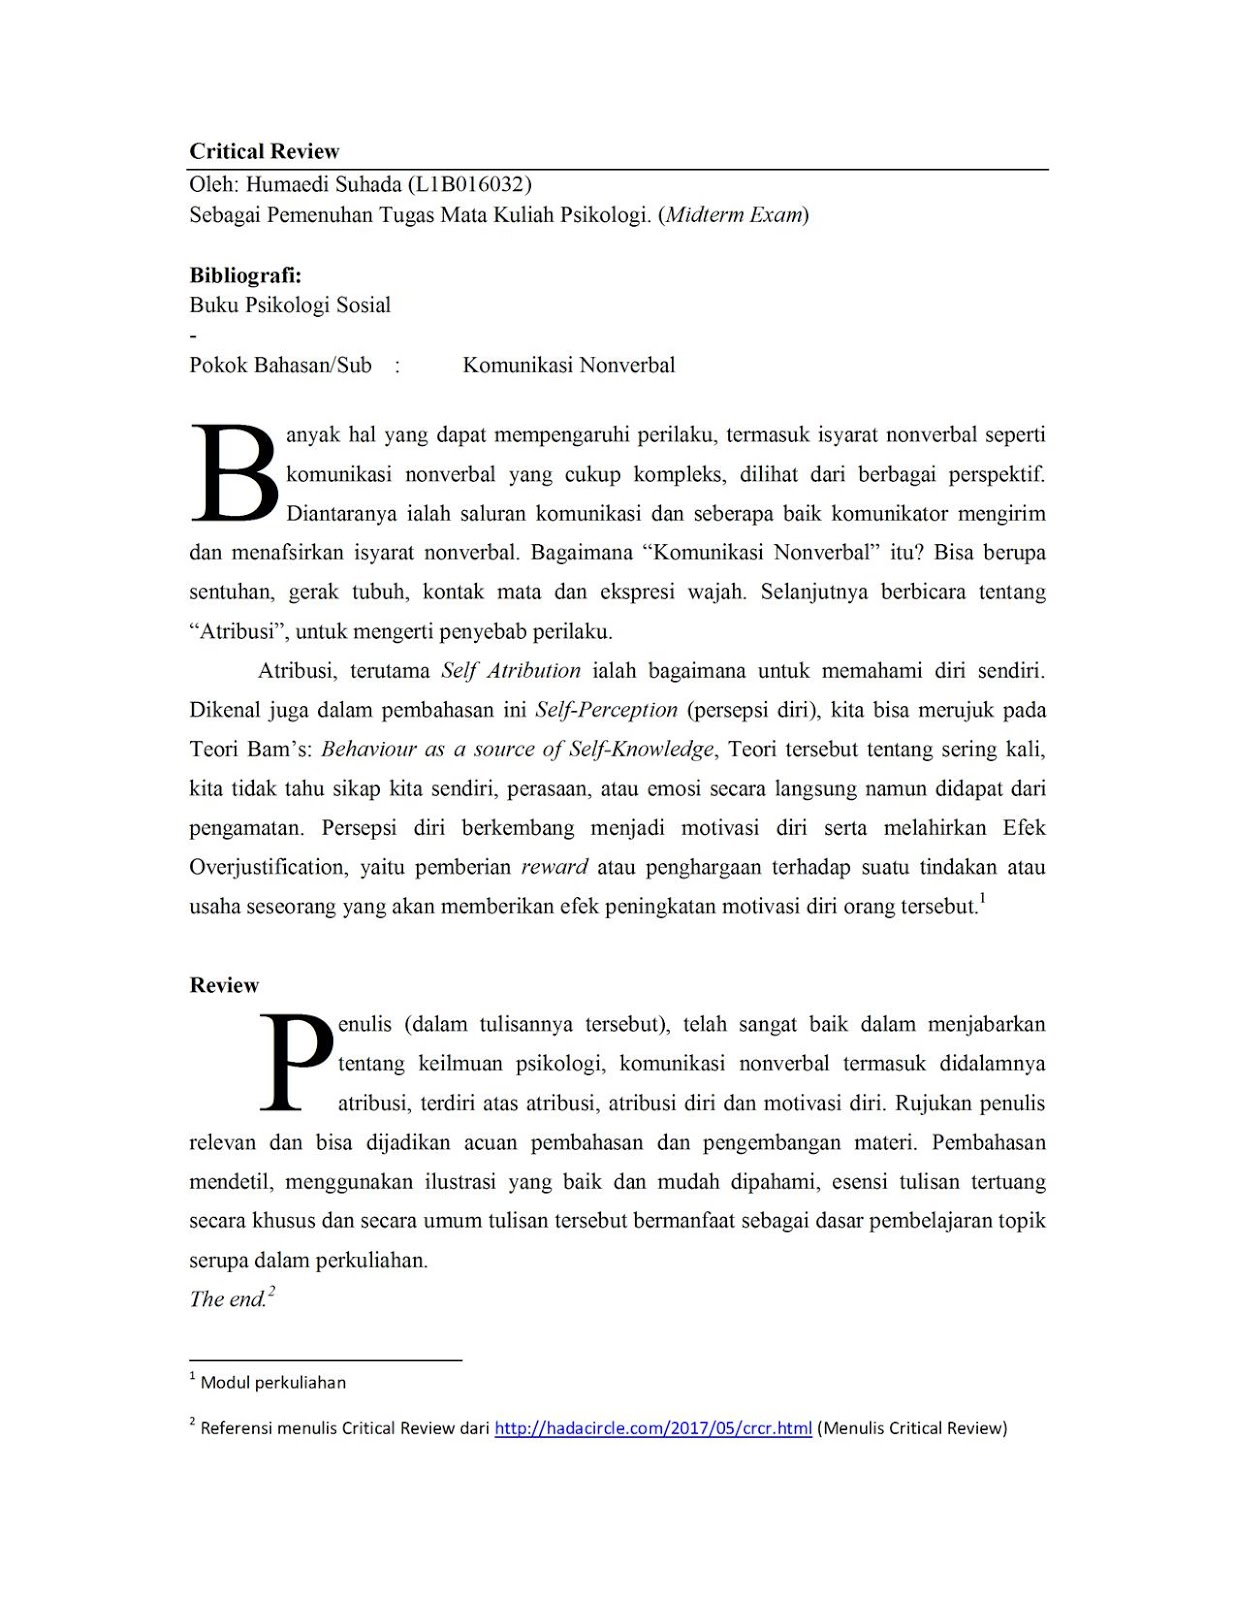 Critical Review: Komunikasi Nonverbal (Psikologi Sosial)